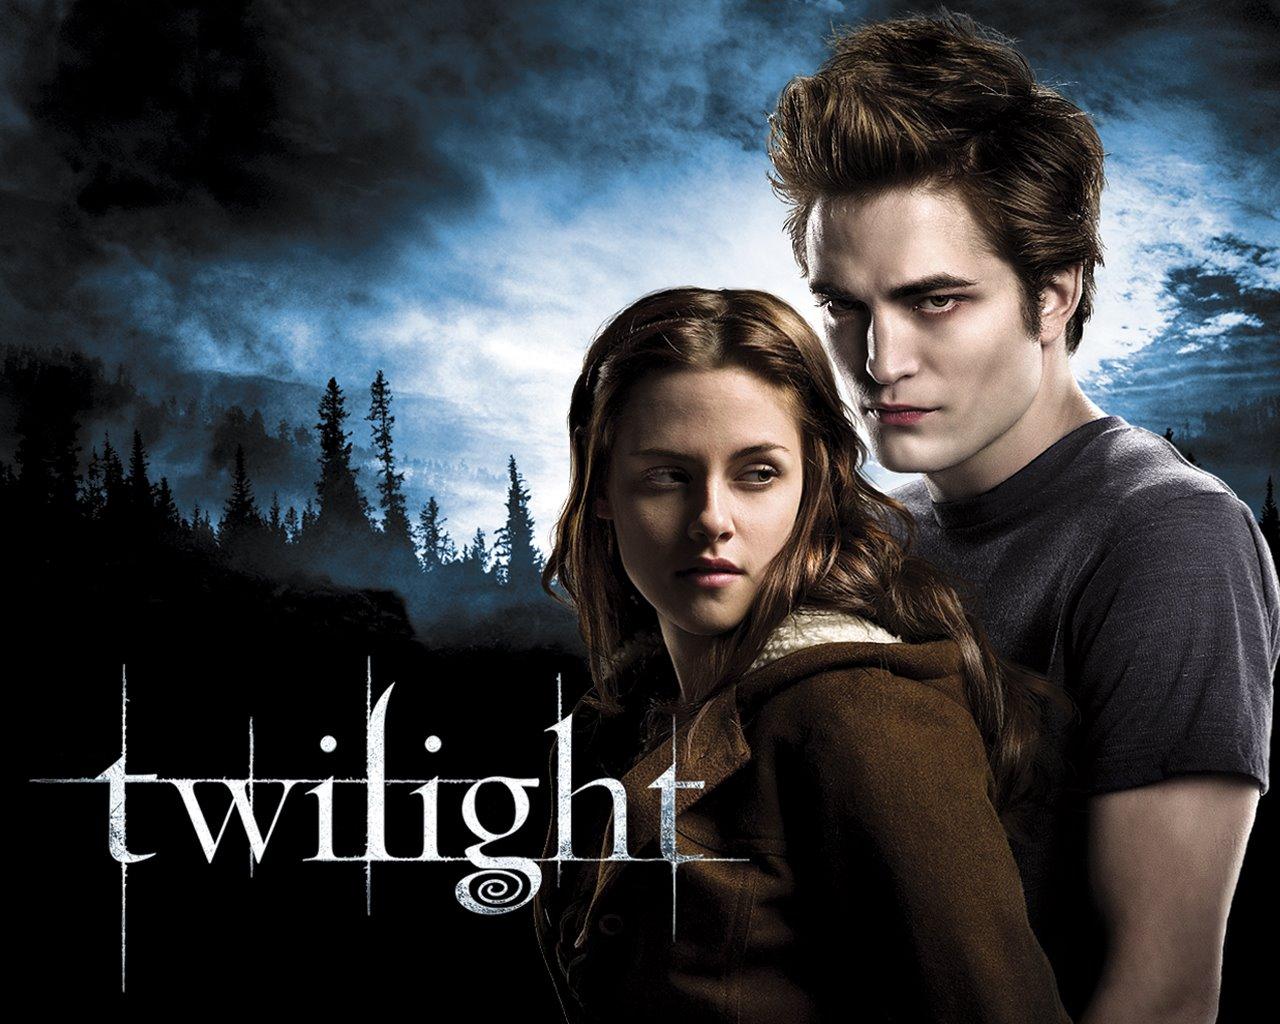 Crepusculo Twilight-wallpaper-crepusculo-fondo-de-pantalla